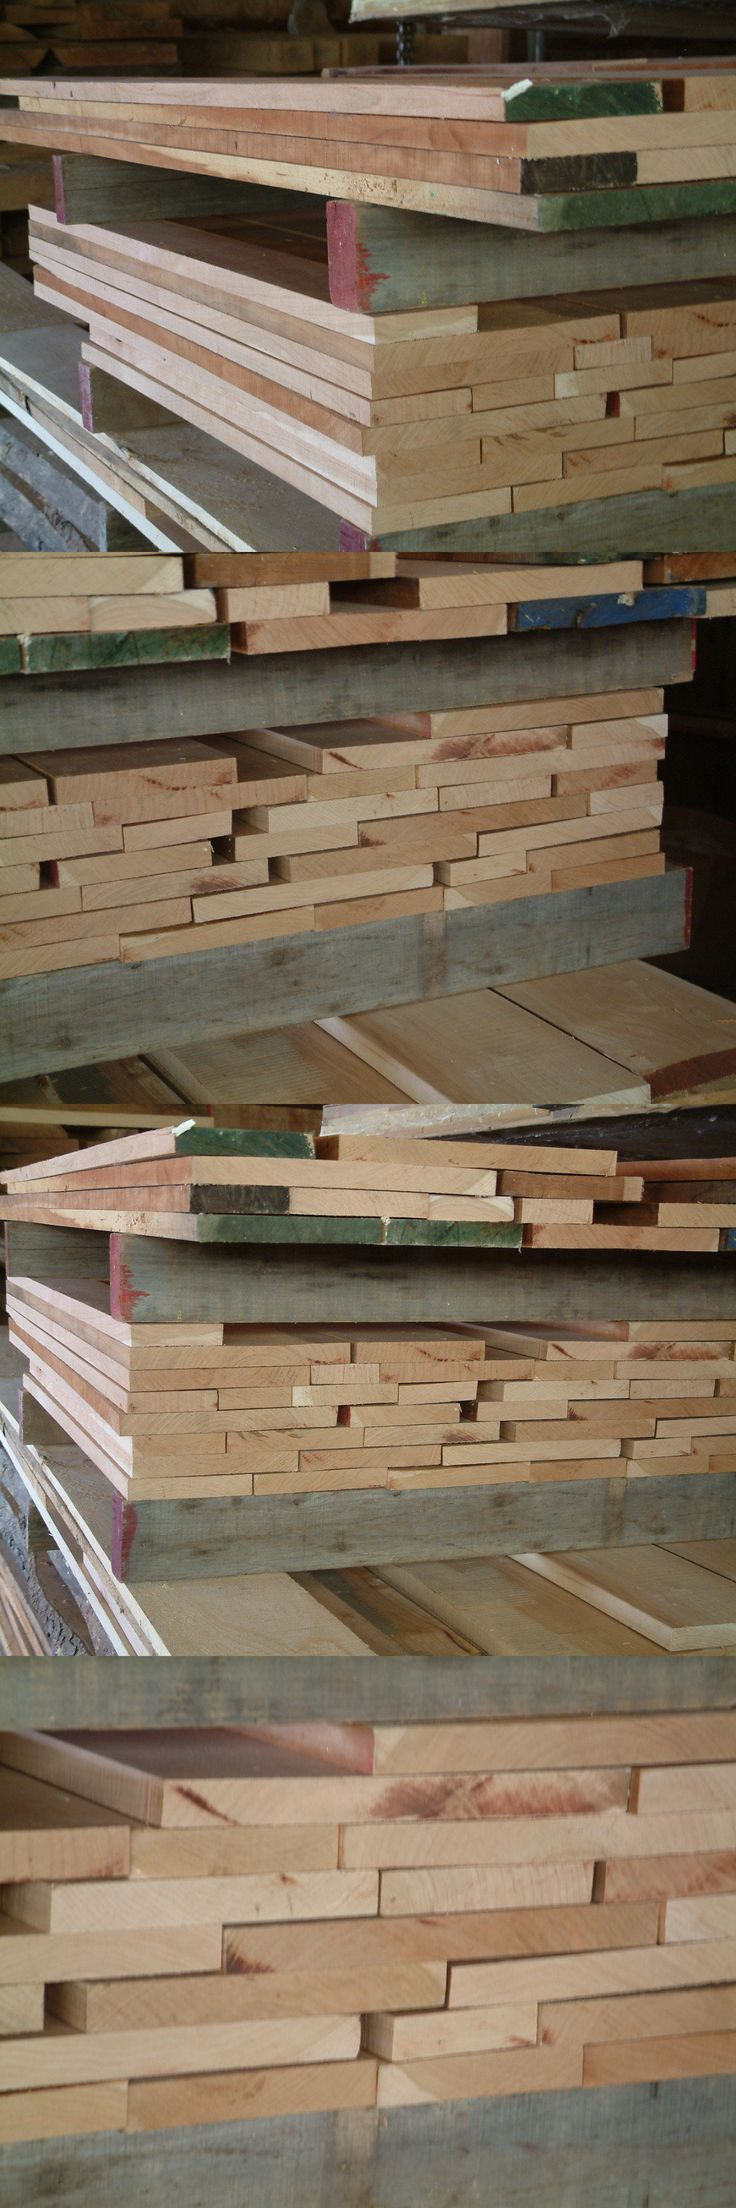 Cherry butcher block top 1 1 2 quot x 26 quot x38 quot kitchen island top ebay - Woodworking Lumber 84011 20 Bf Kiln Dried Black Cherry 4 4 Wood Lumber Bundles